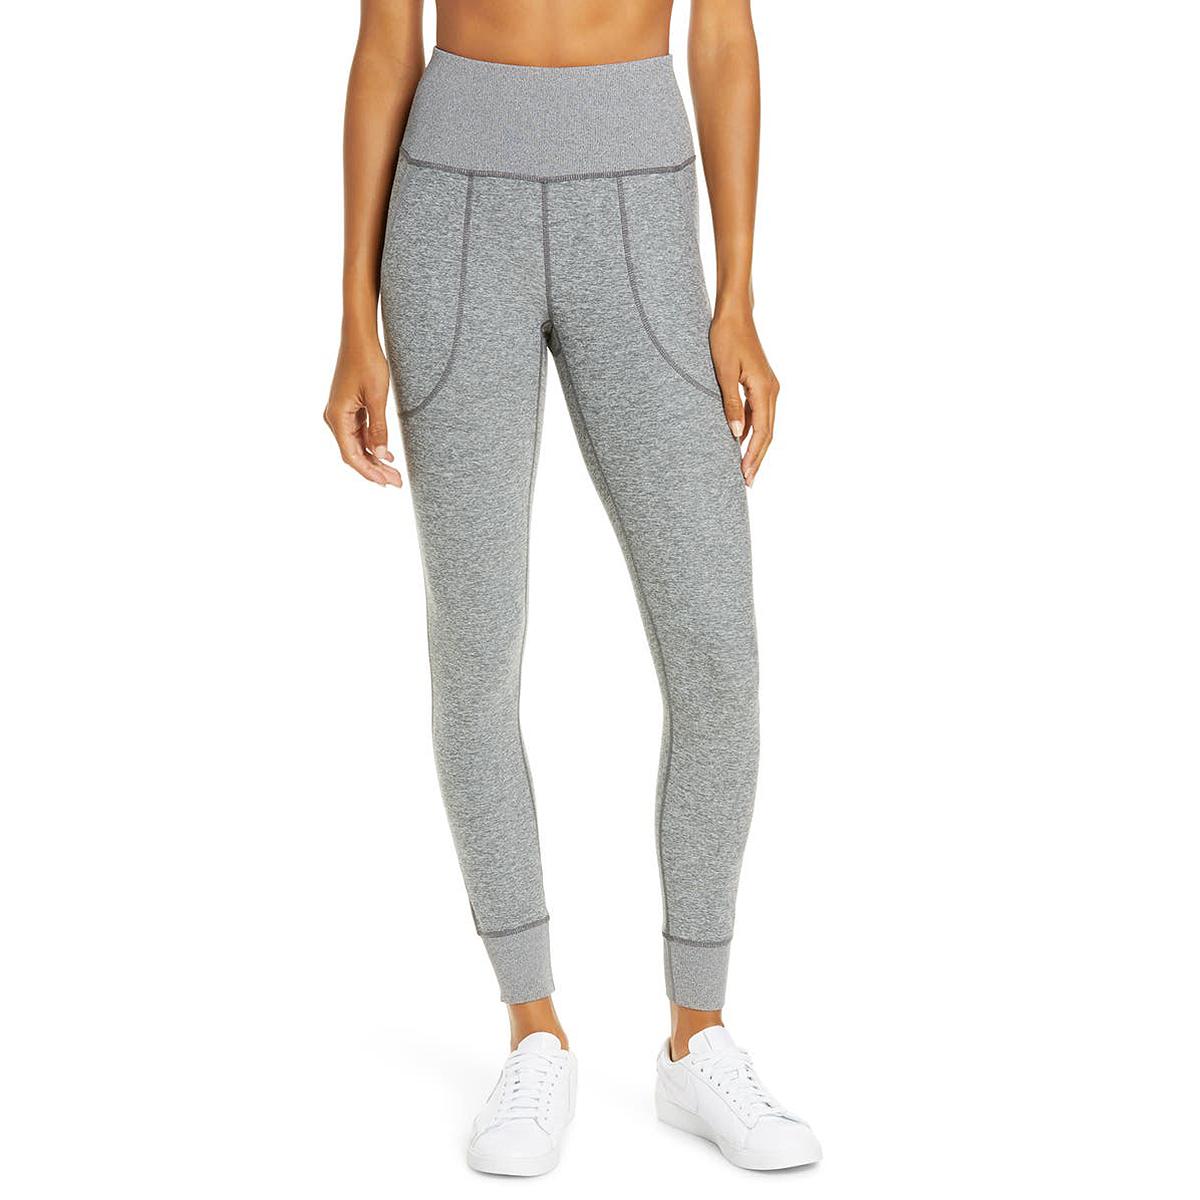 nordstrom-anniversary-sale-zella-leggings-grey